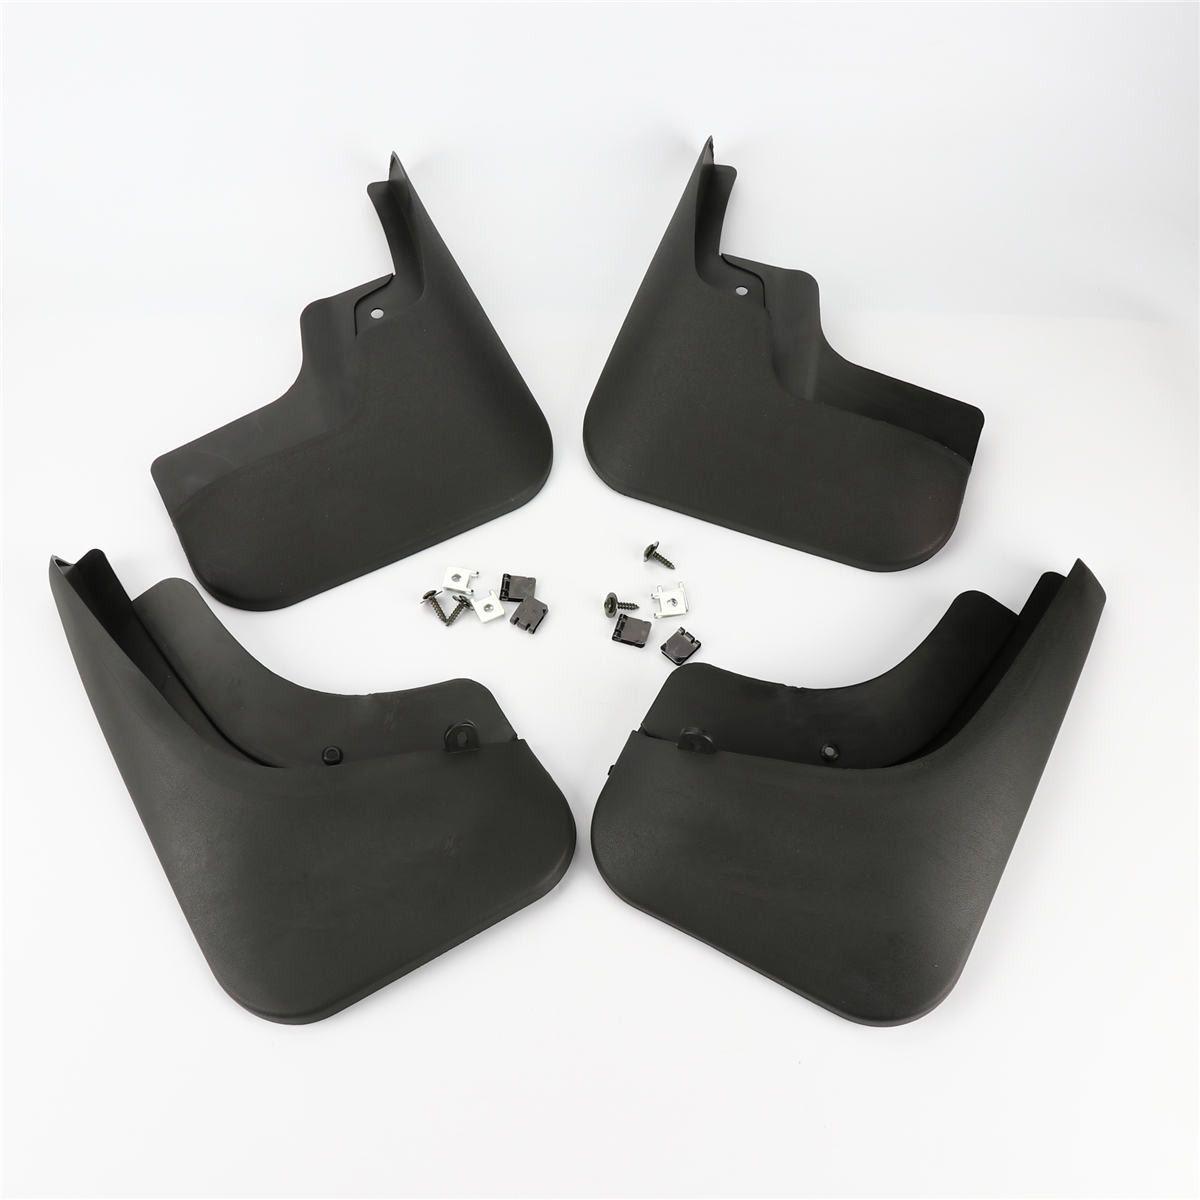 Fender Mud Flaps Splash Guard 1 Set For VW Tiguan 2013